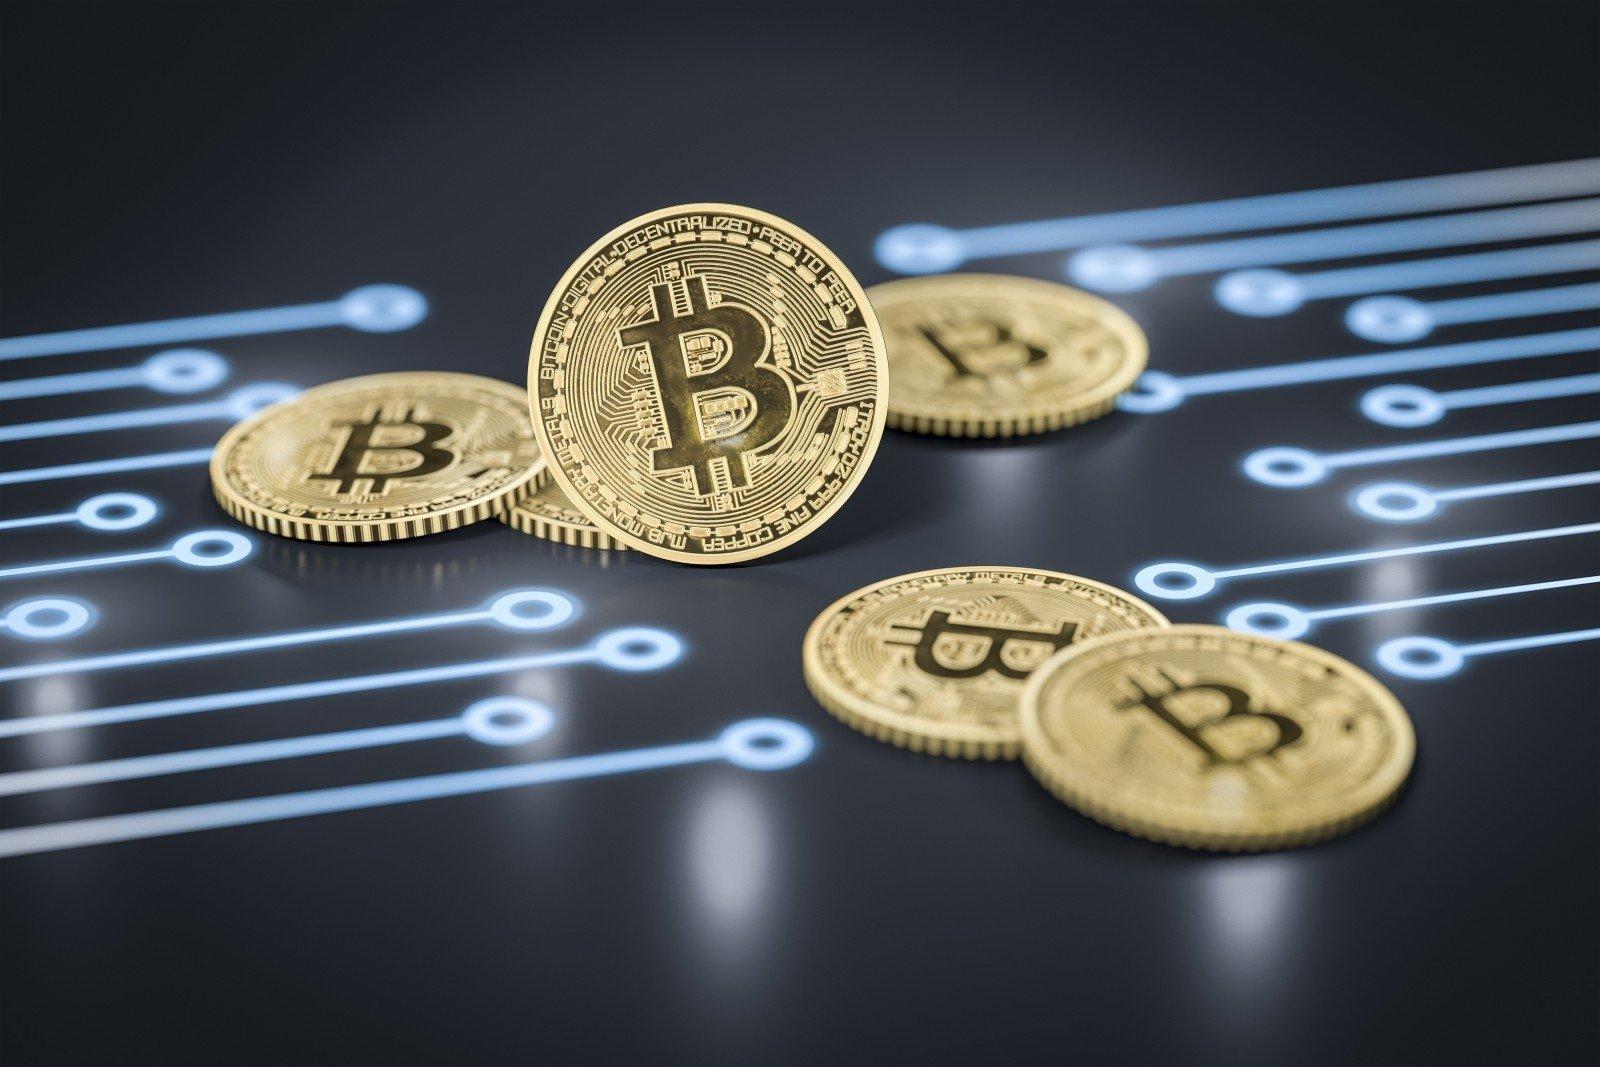 Valiutos kurso kriptovaliuta, Bitcoin valiuta, kursas